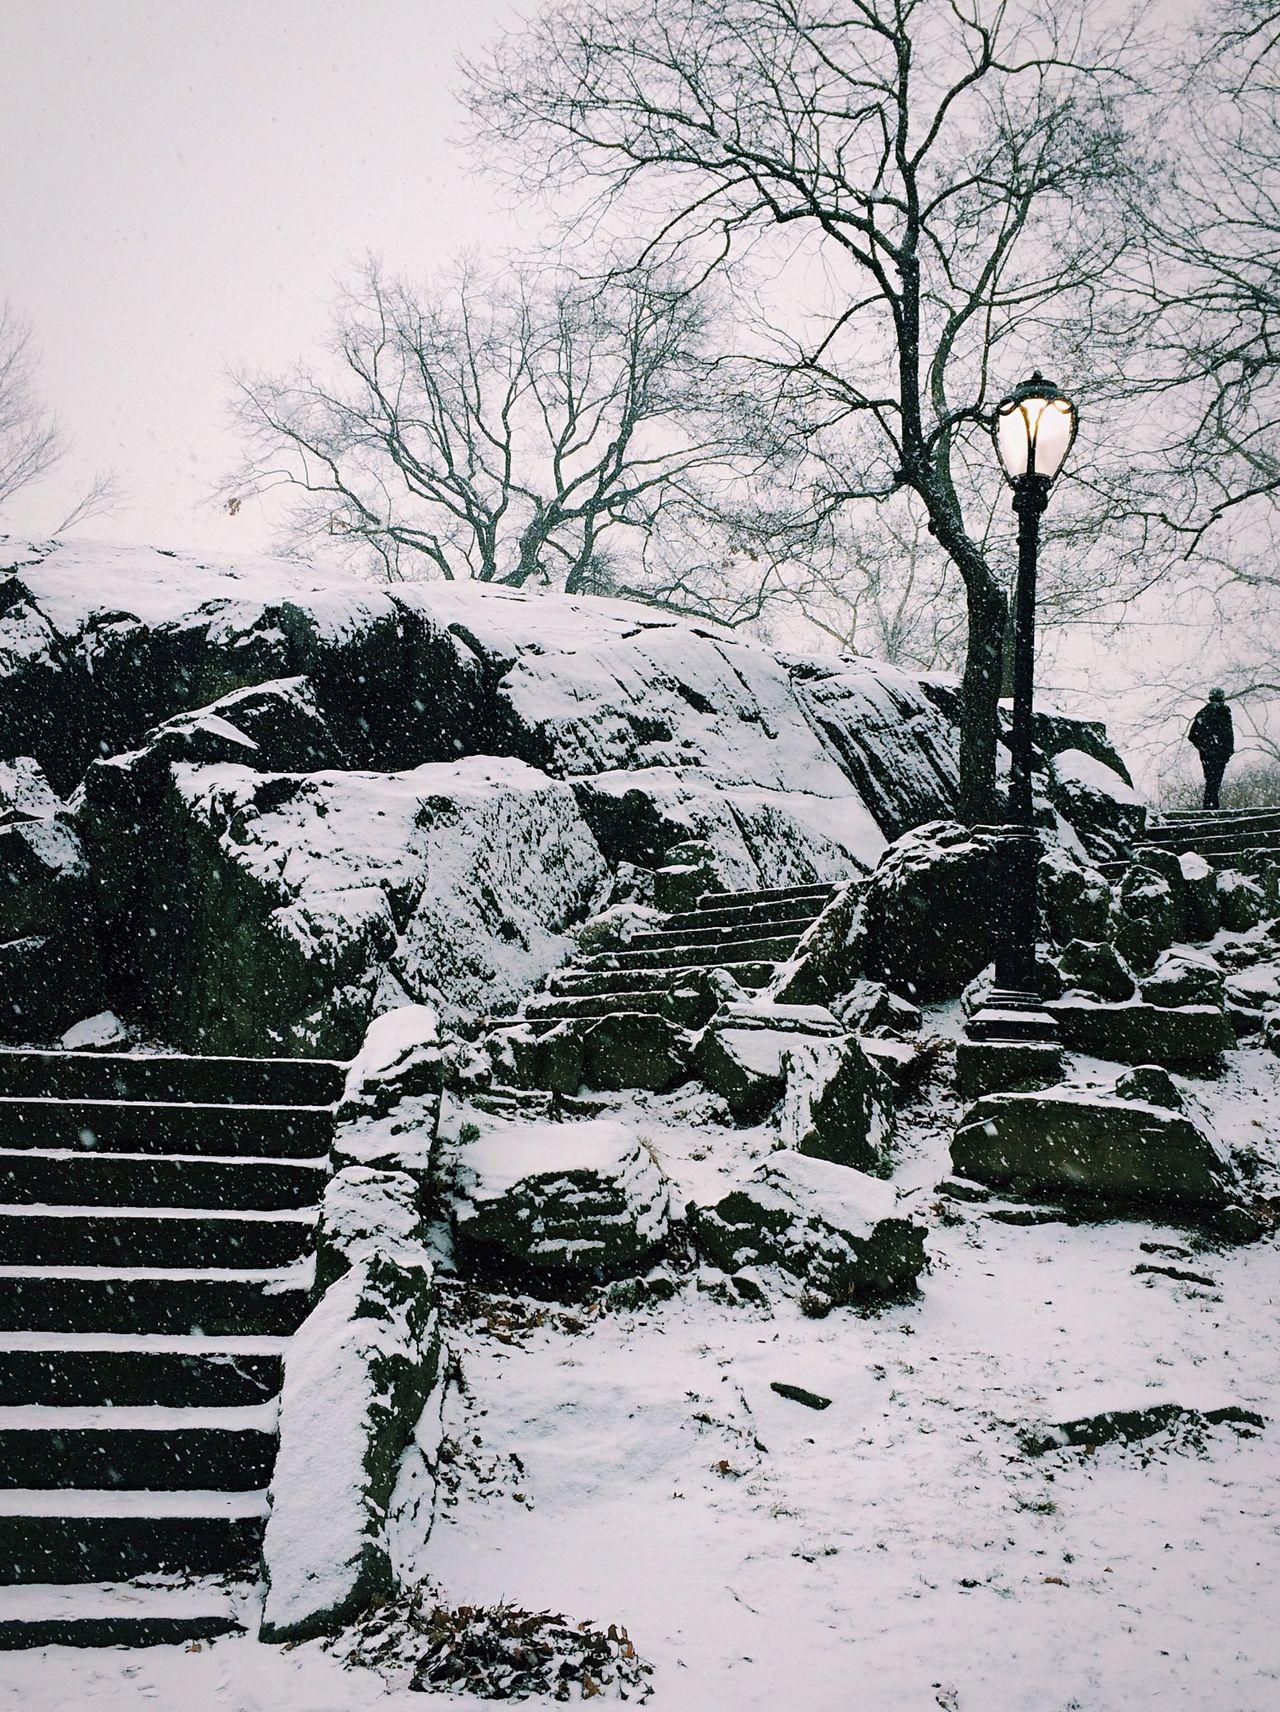 Winter in Central Park Deepfreeze